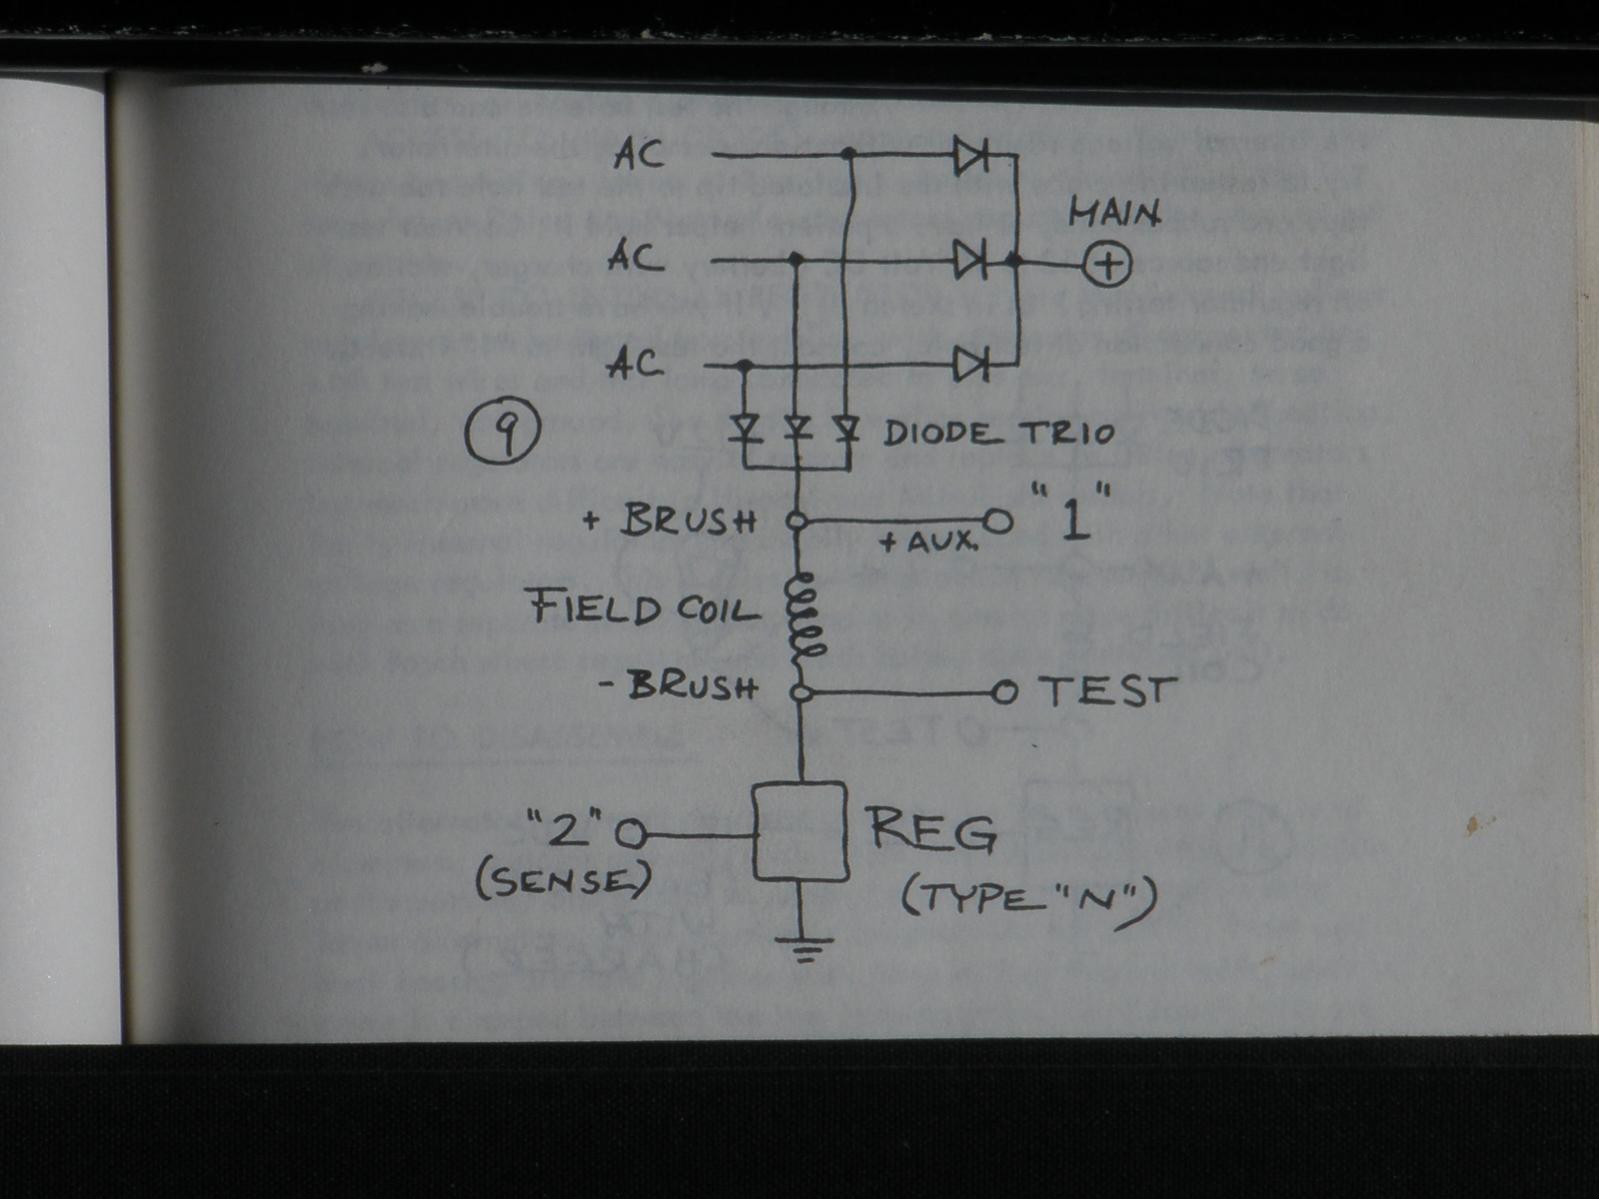 Alternator Welder Page 2 Click Image For Larger Versionnamewiring Diagramjpgviews728size132 Version Name Delco Regulator Views 216